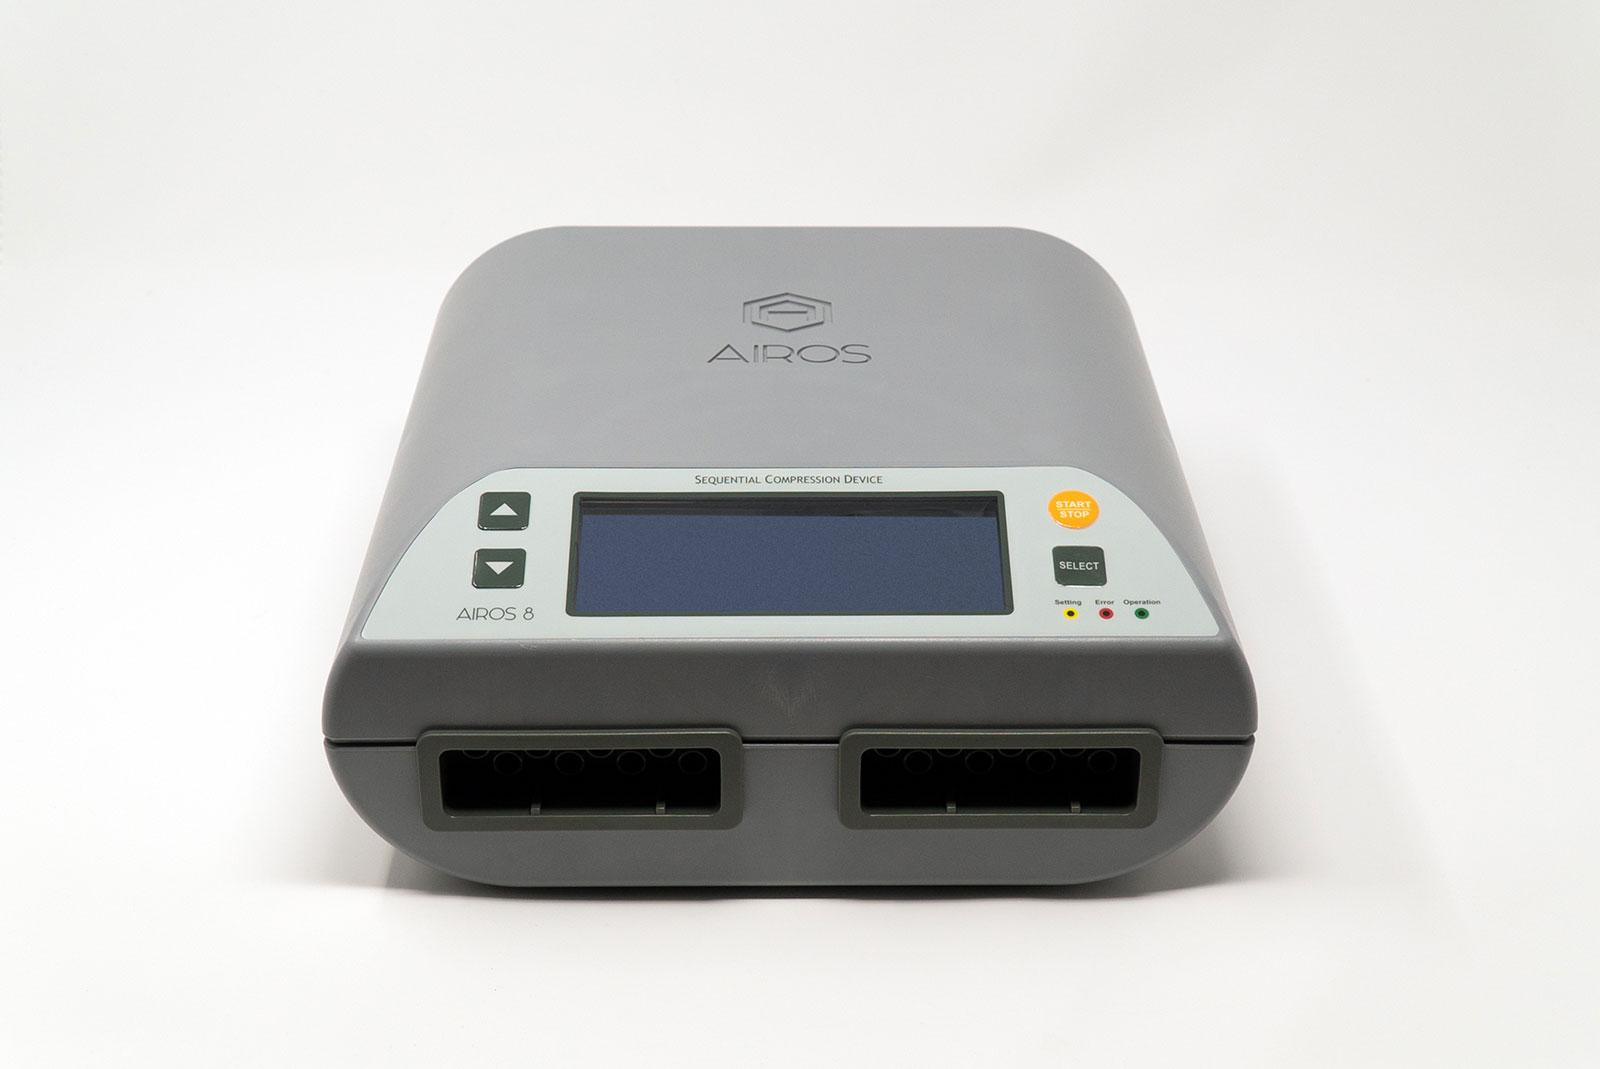 AIROS 8